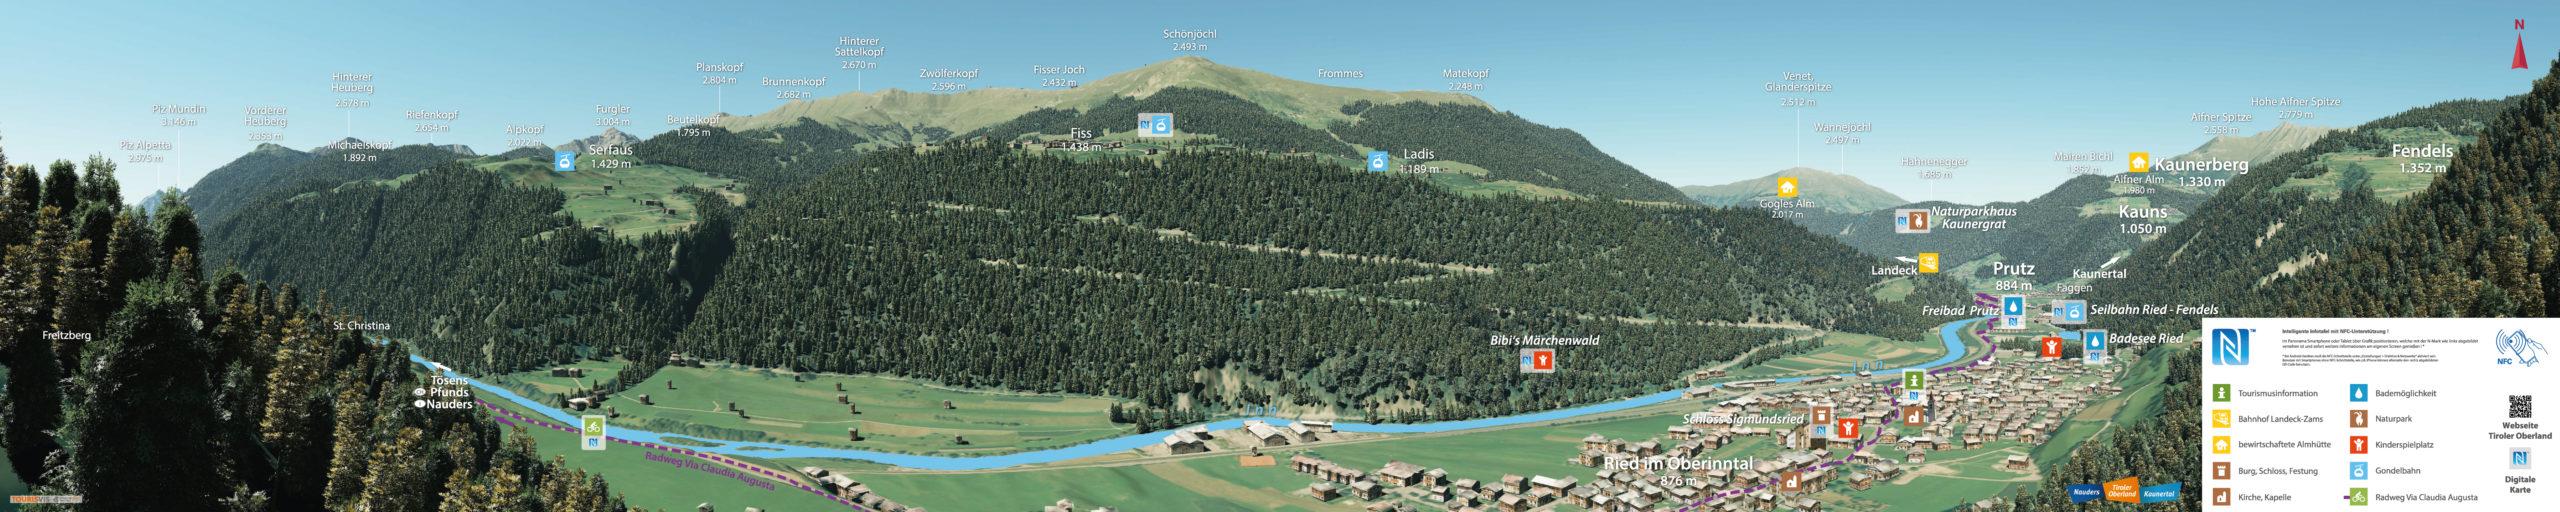 3D Gipfelpanorama Lutzel Oefele Tiroler Oberland